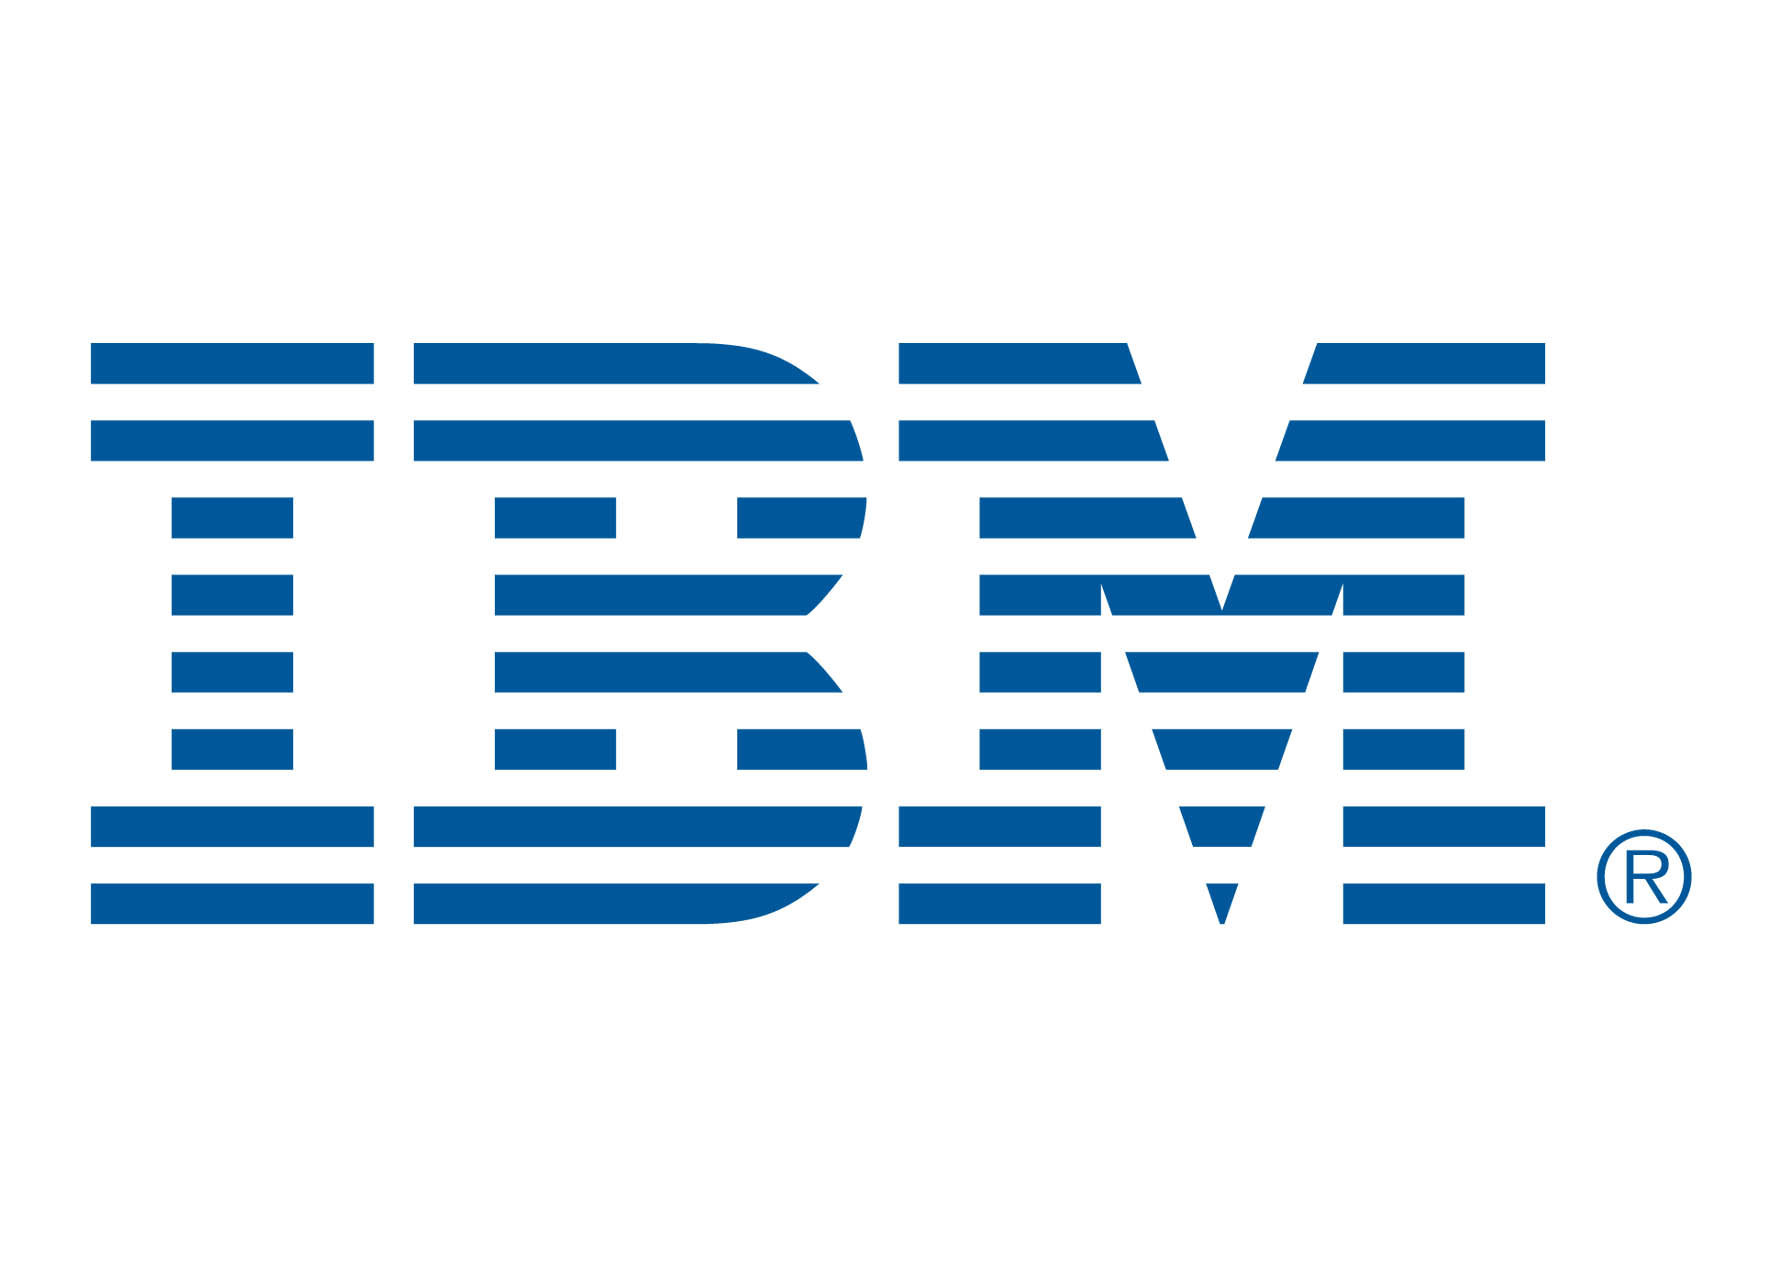 IBM Wave Analysis – 06 February, 2019